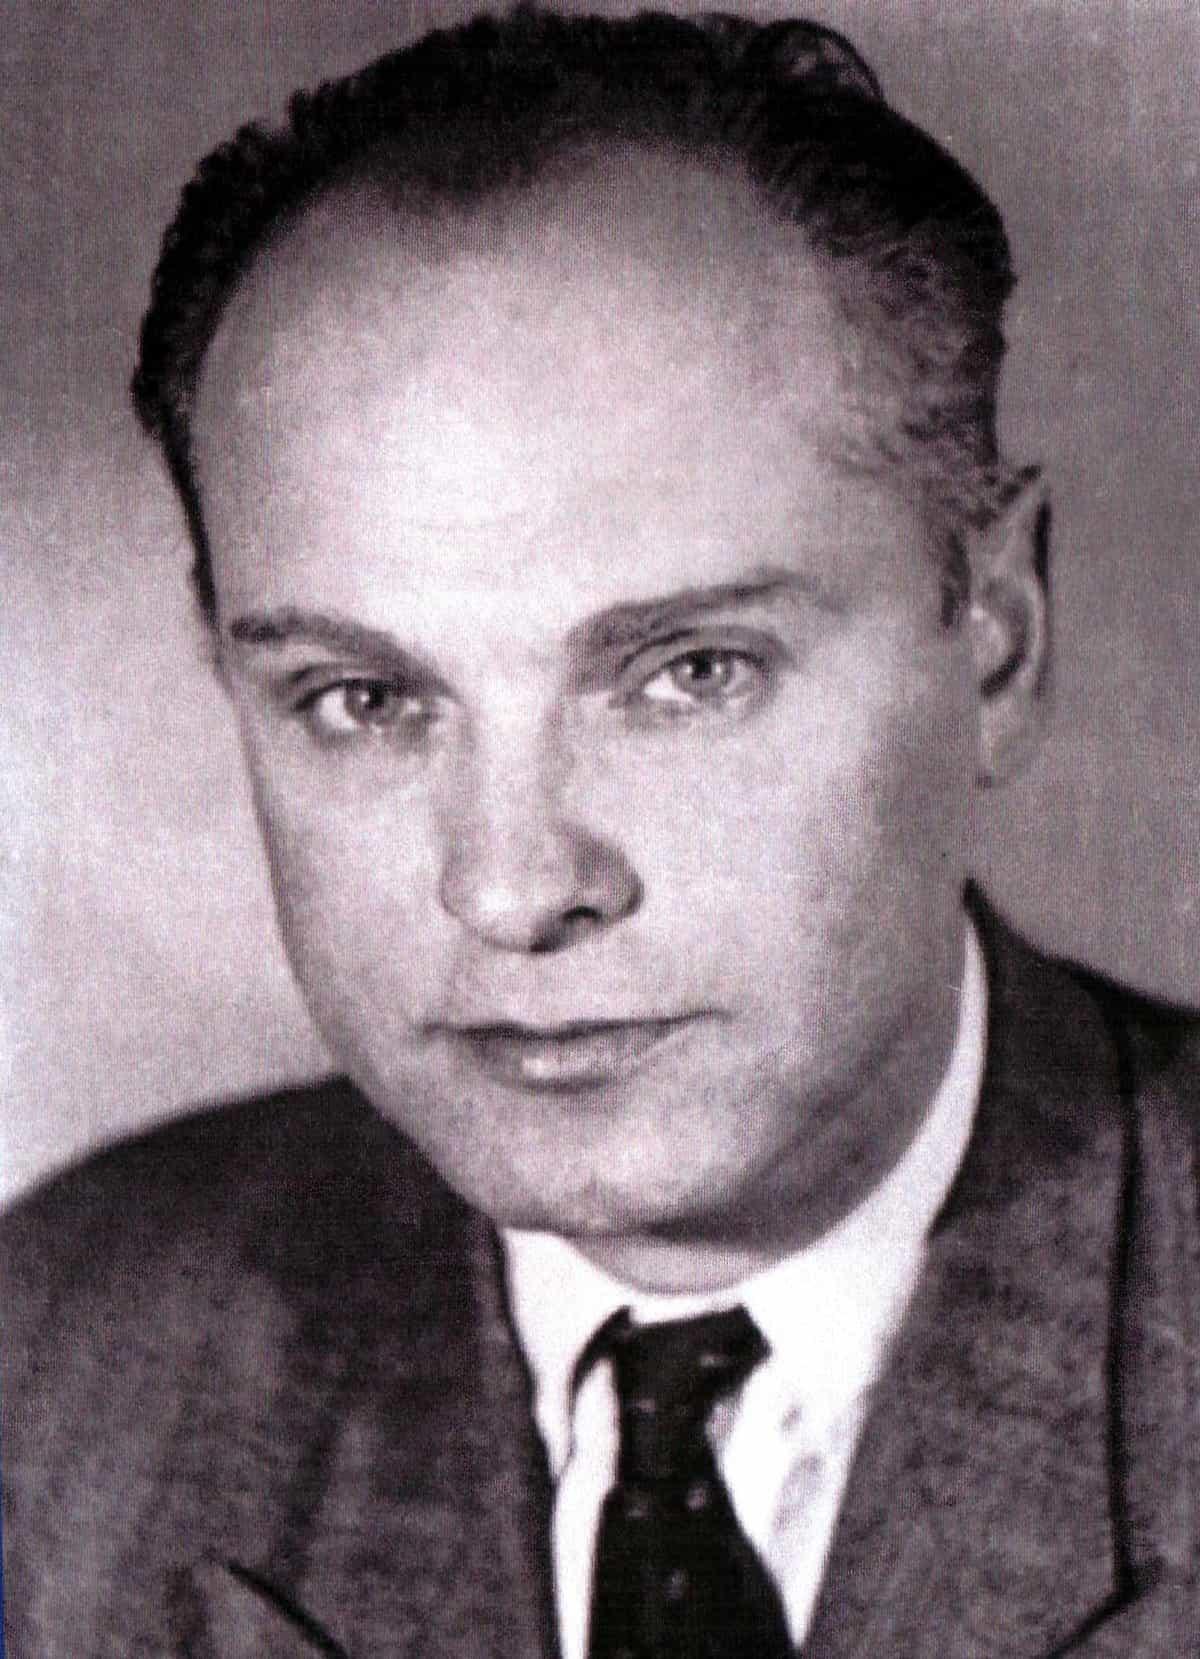 Ion Chiricuță